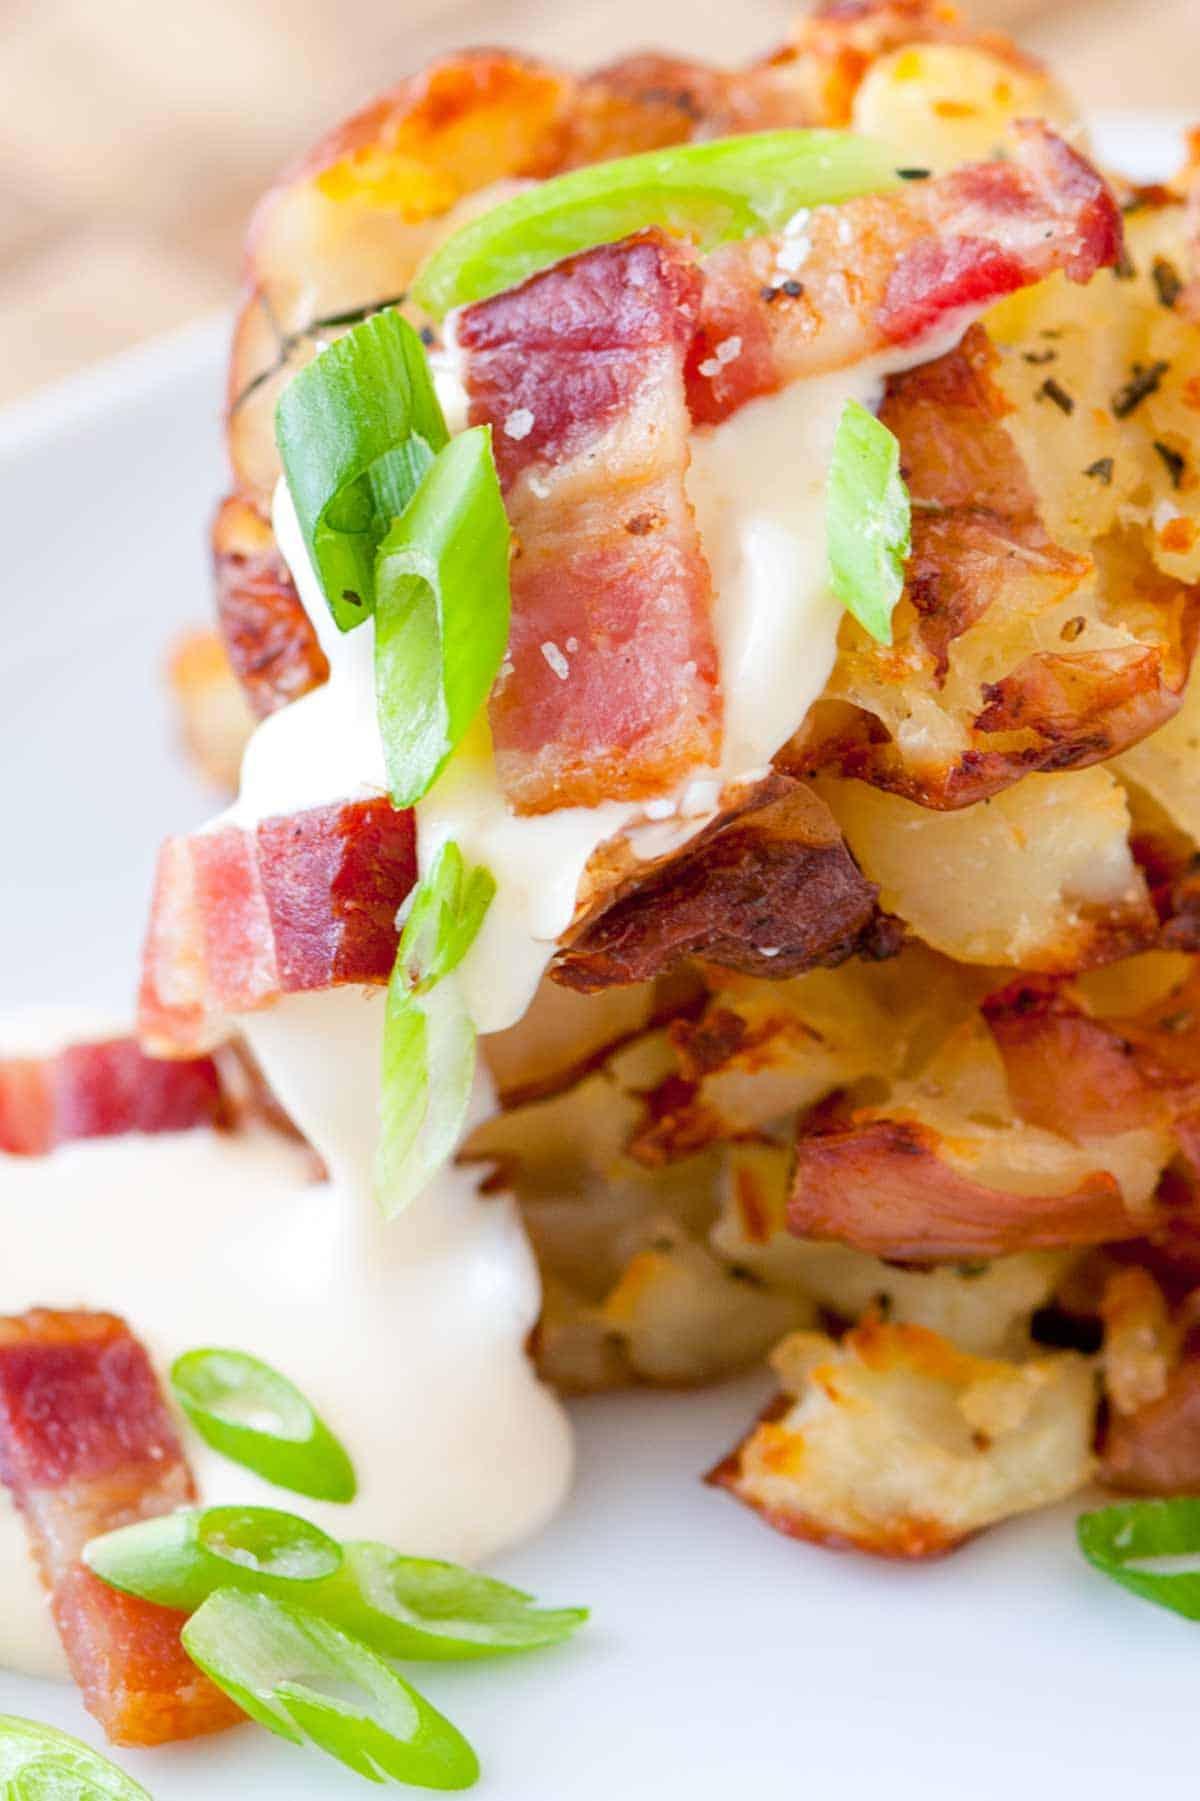 How to Make Bacon Roasted Potatoes